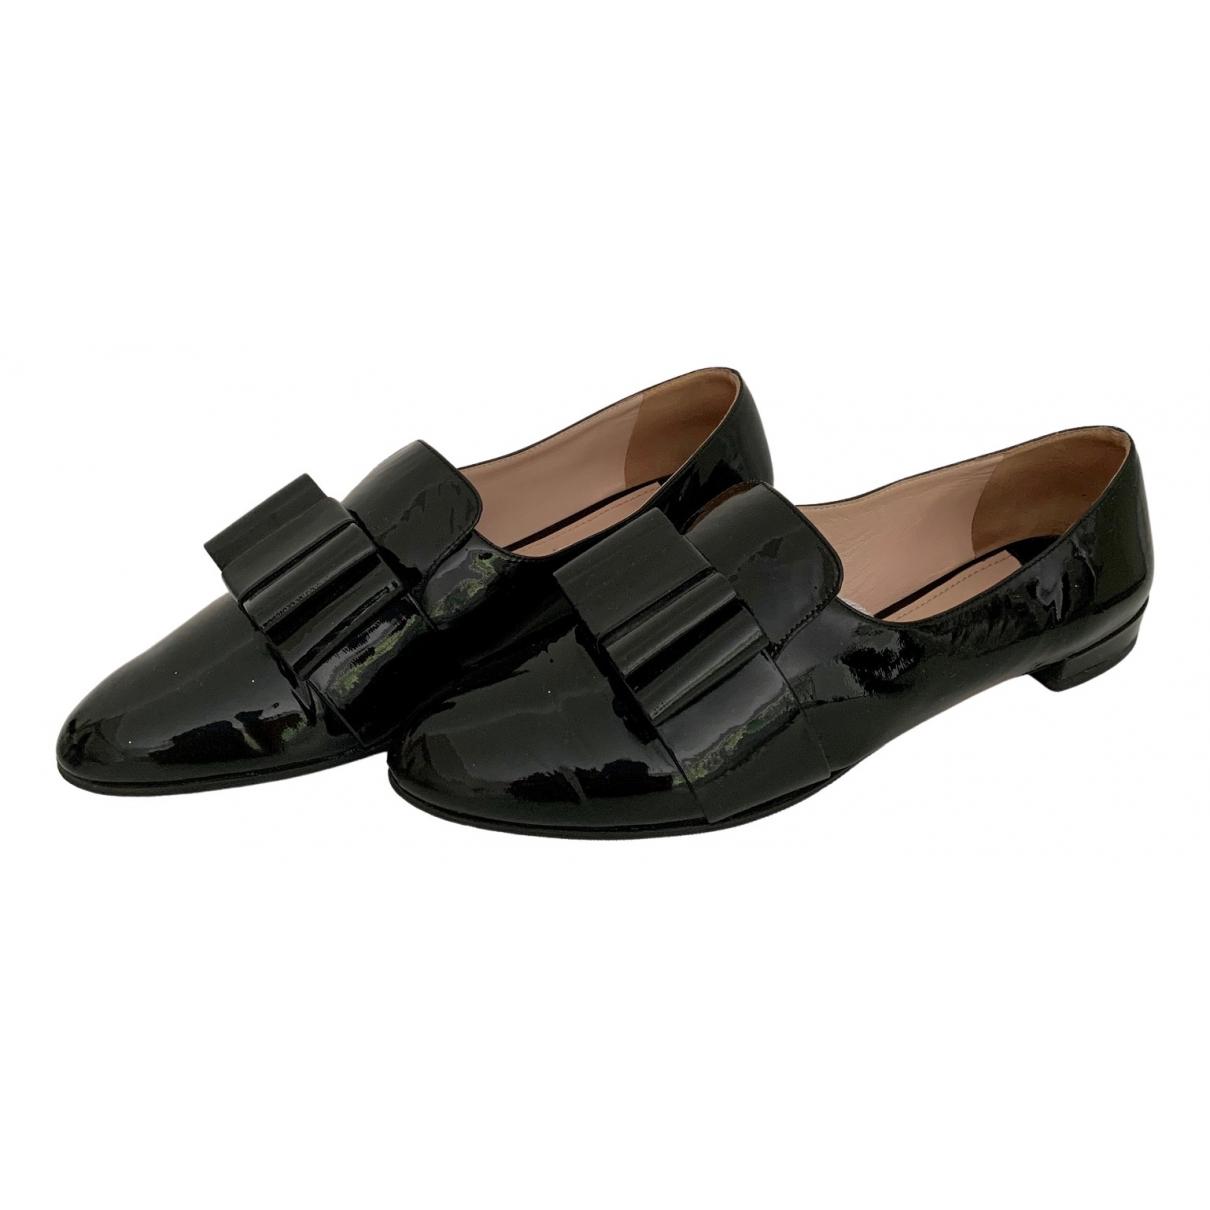 Miu Miu \N Black Patent leather Flats for Women 40 EU